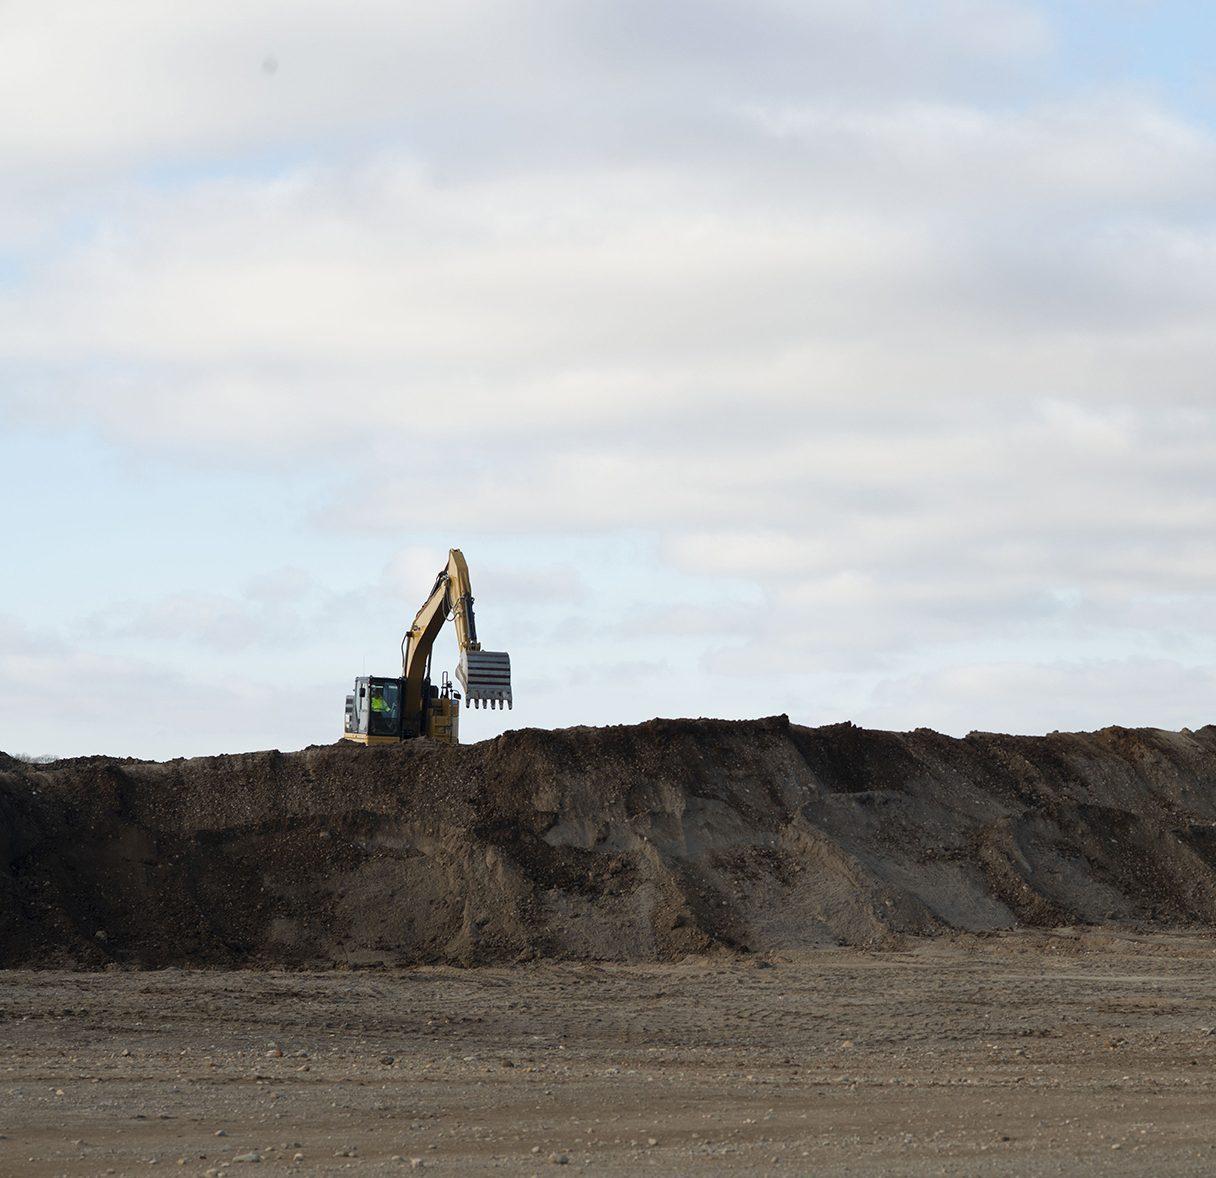 Large excavator working